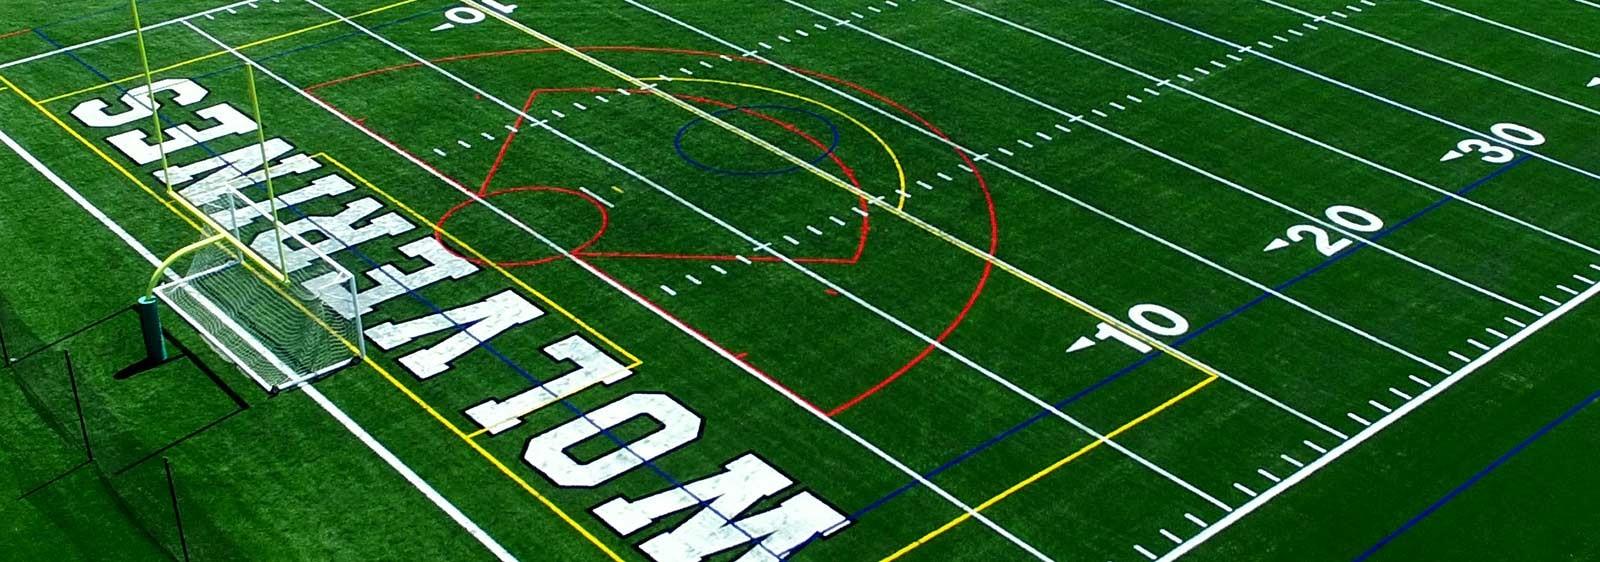 astro-turf-sports-field